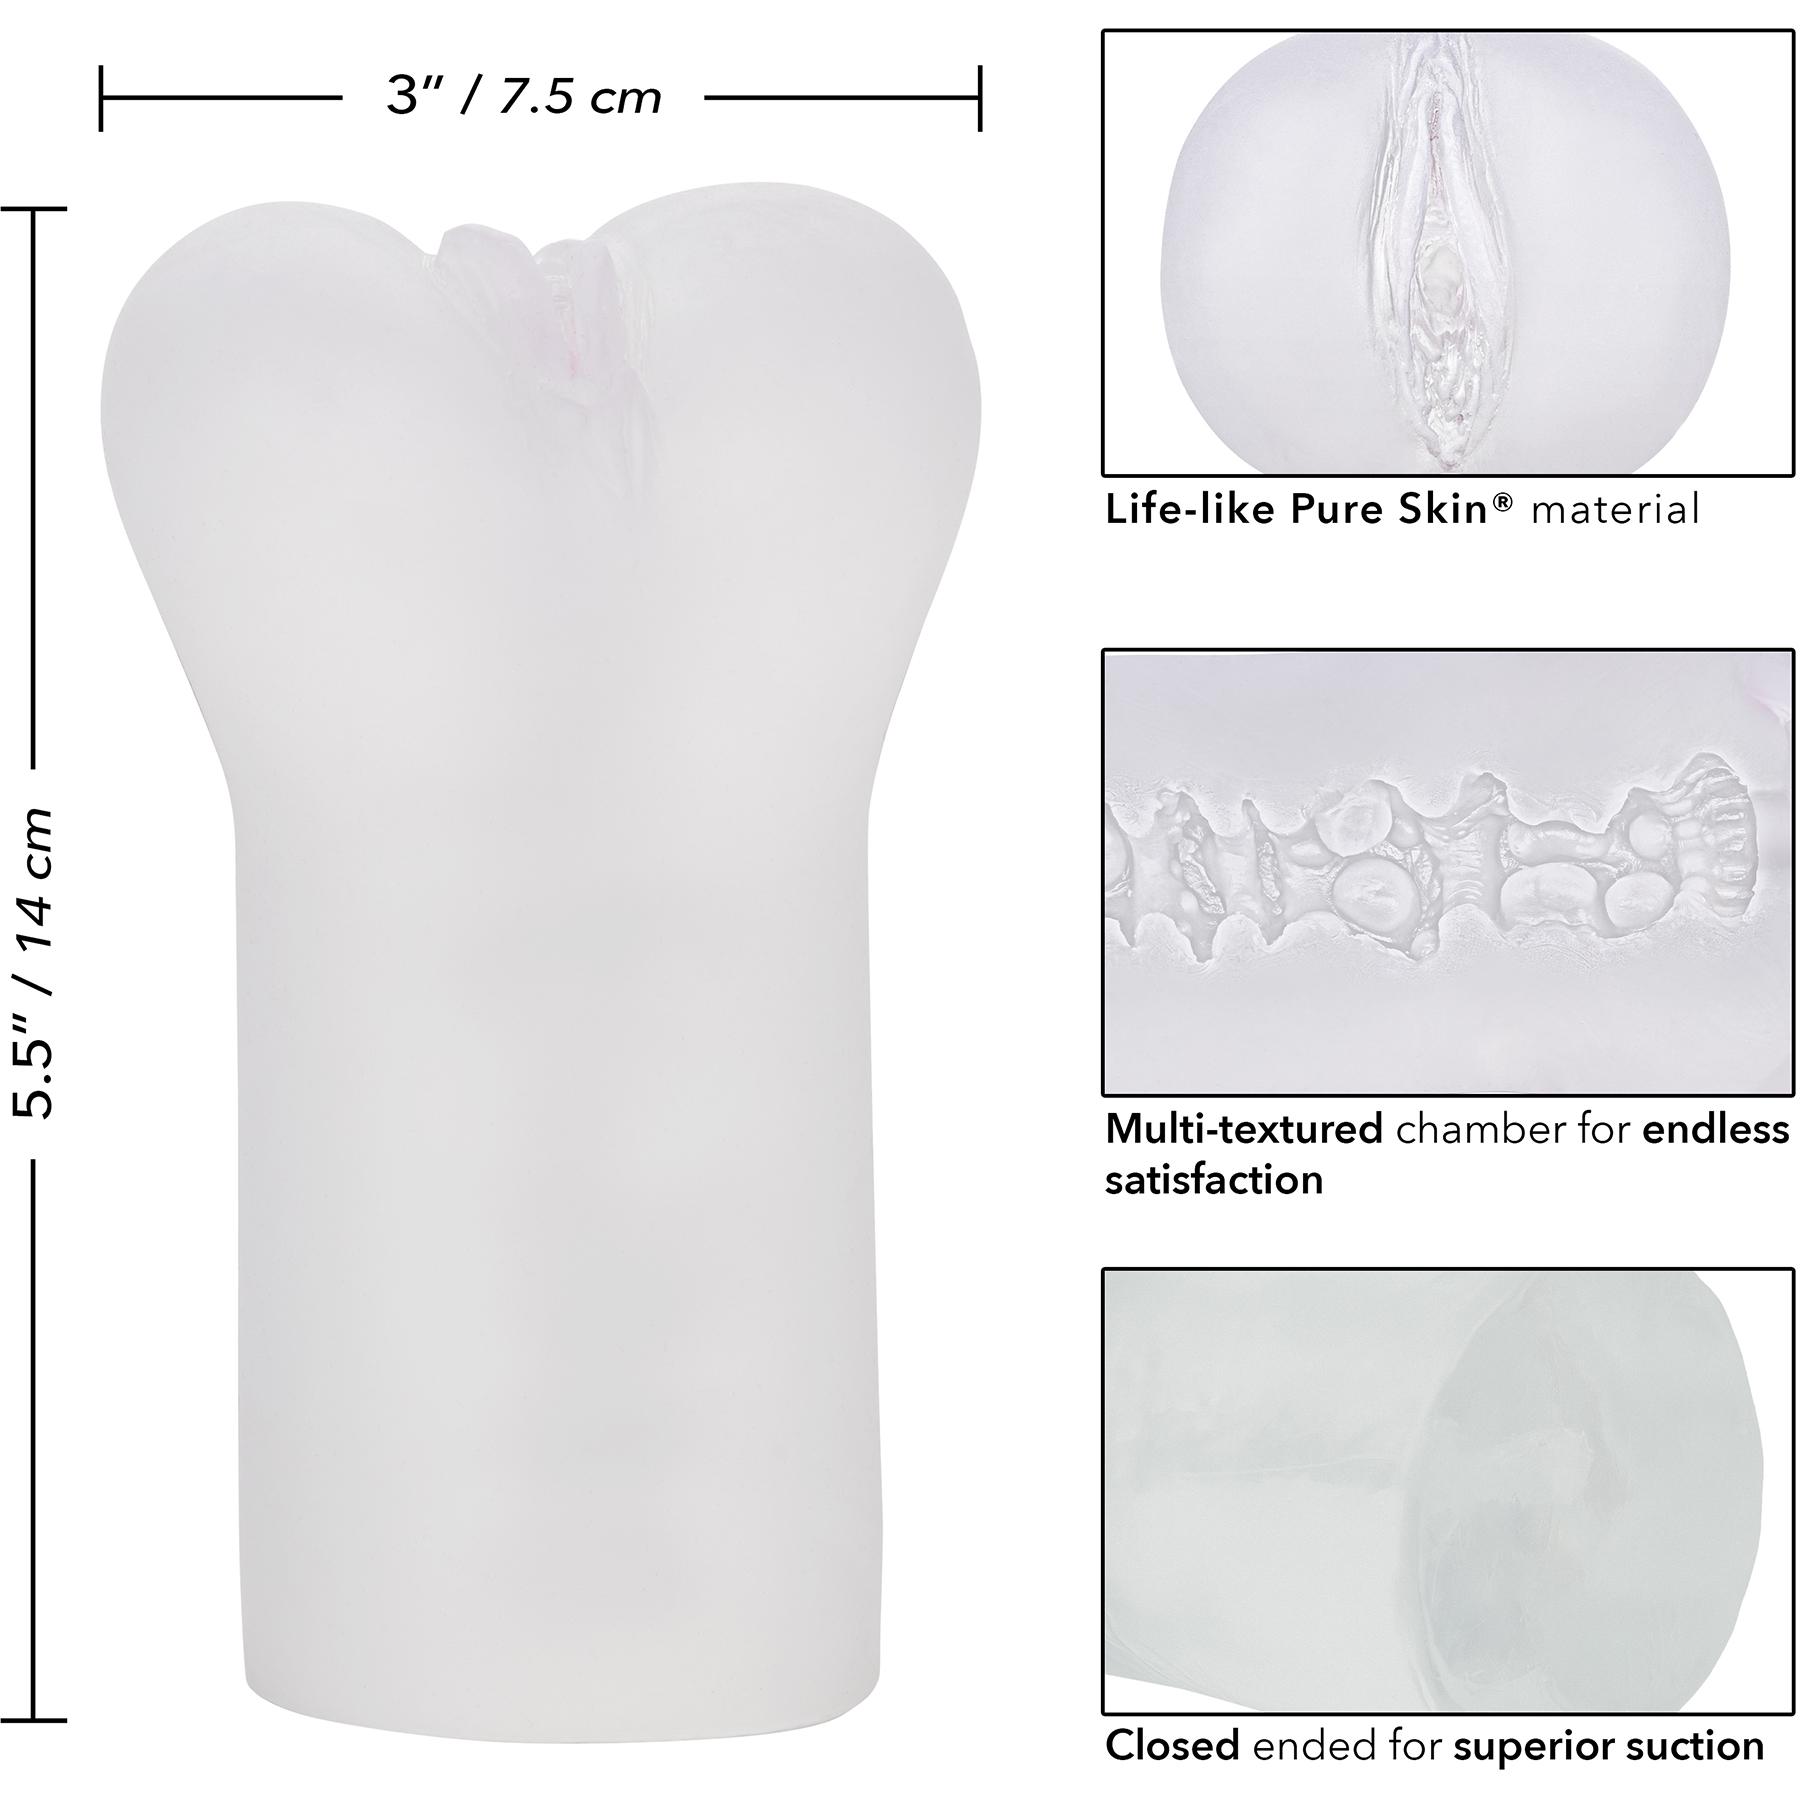 Boundless Vulva Penis Masturbator By CalExotics - Measurements